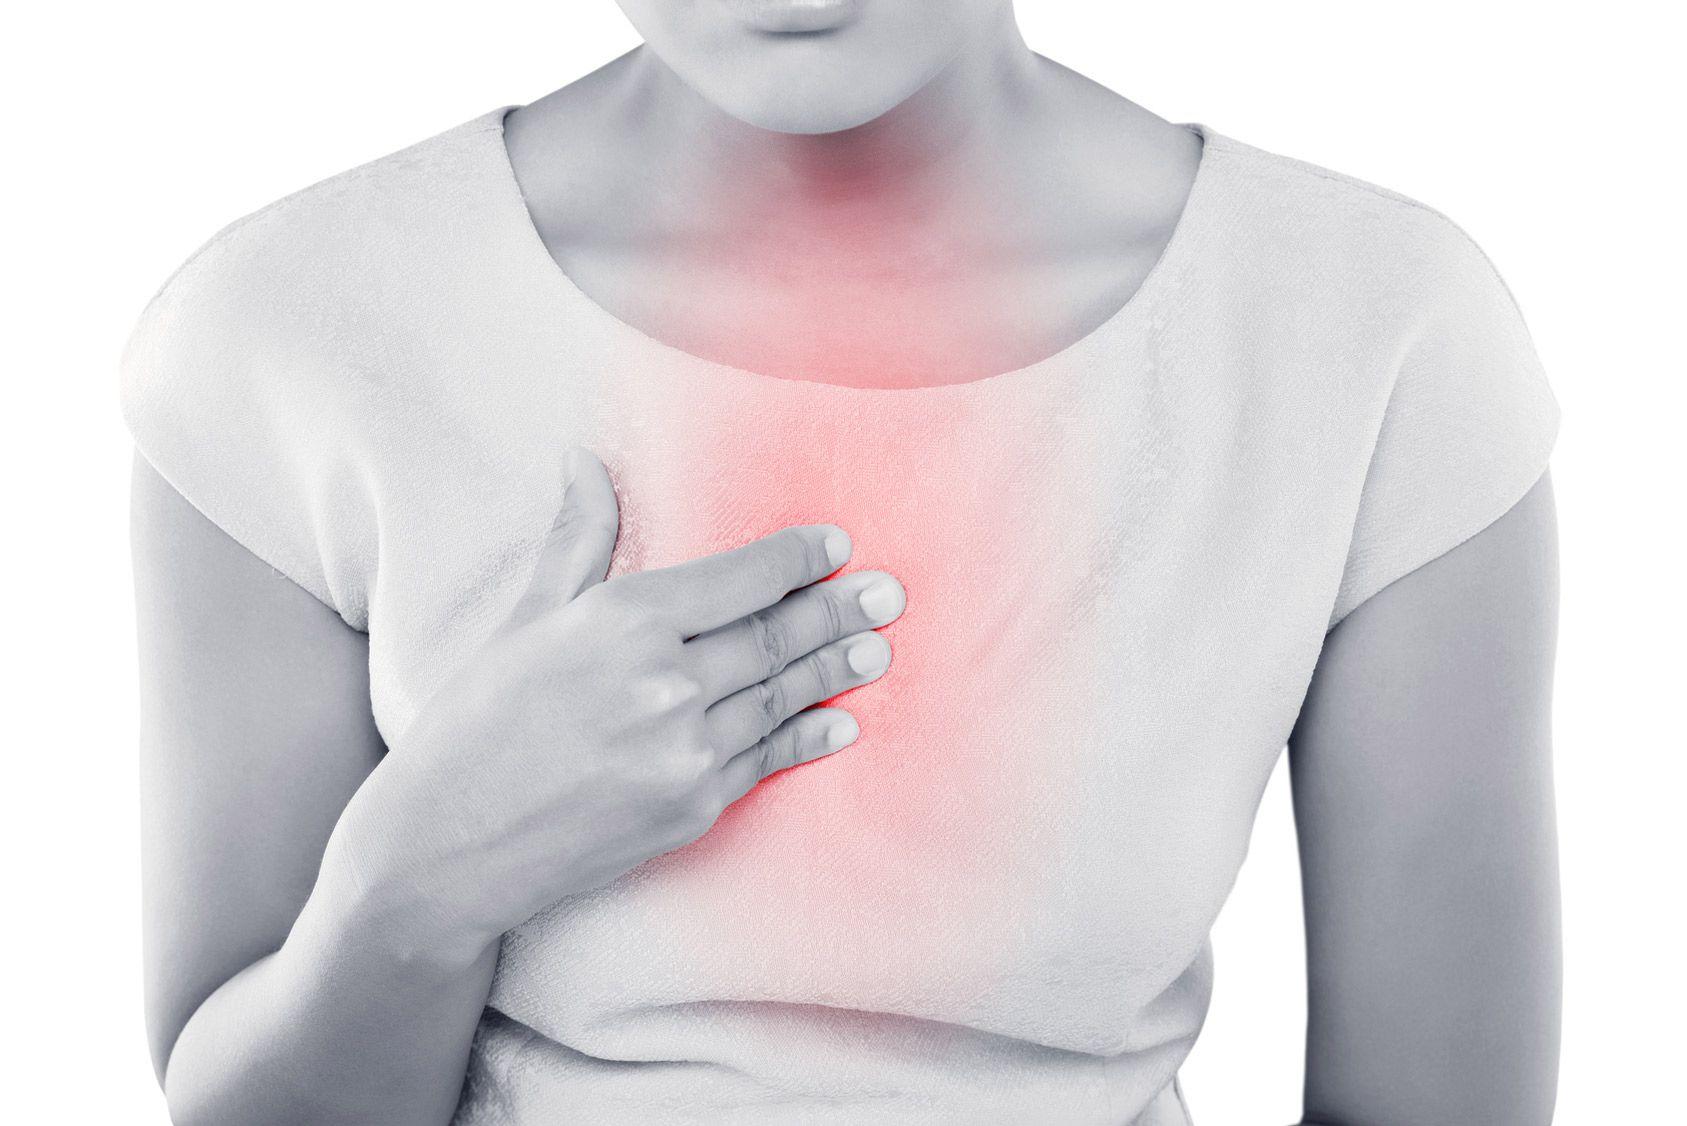 Calmer le reflux gastro-œsophagien